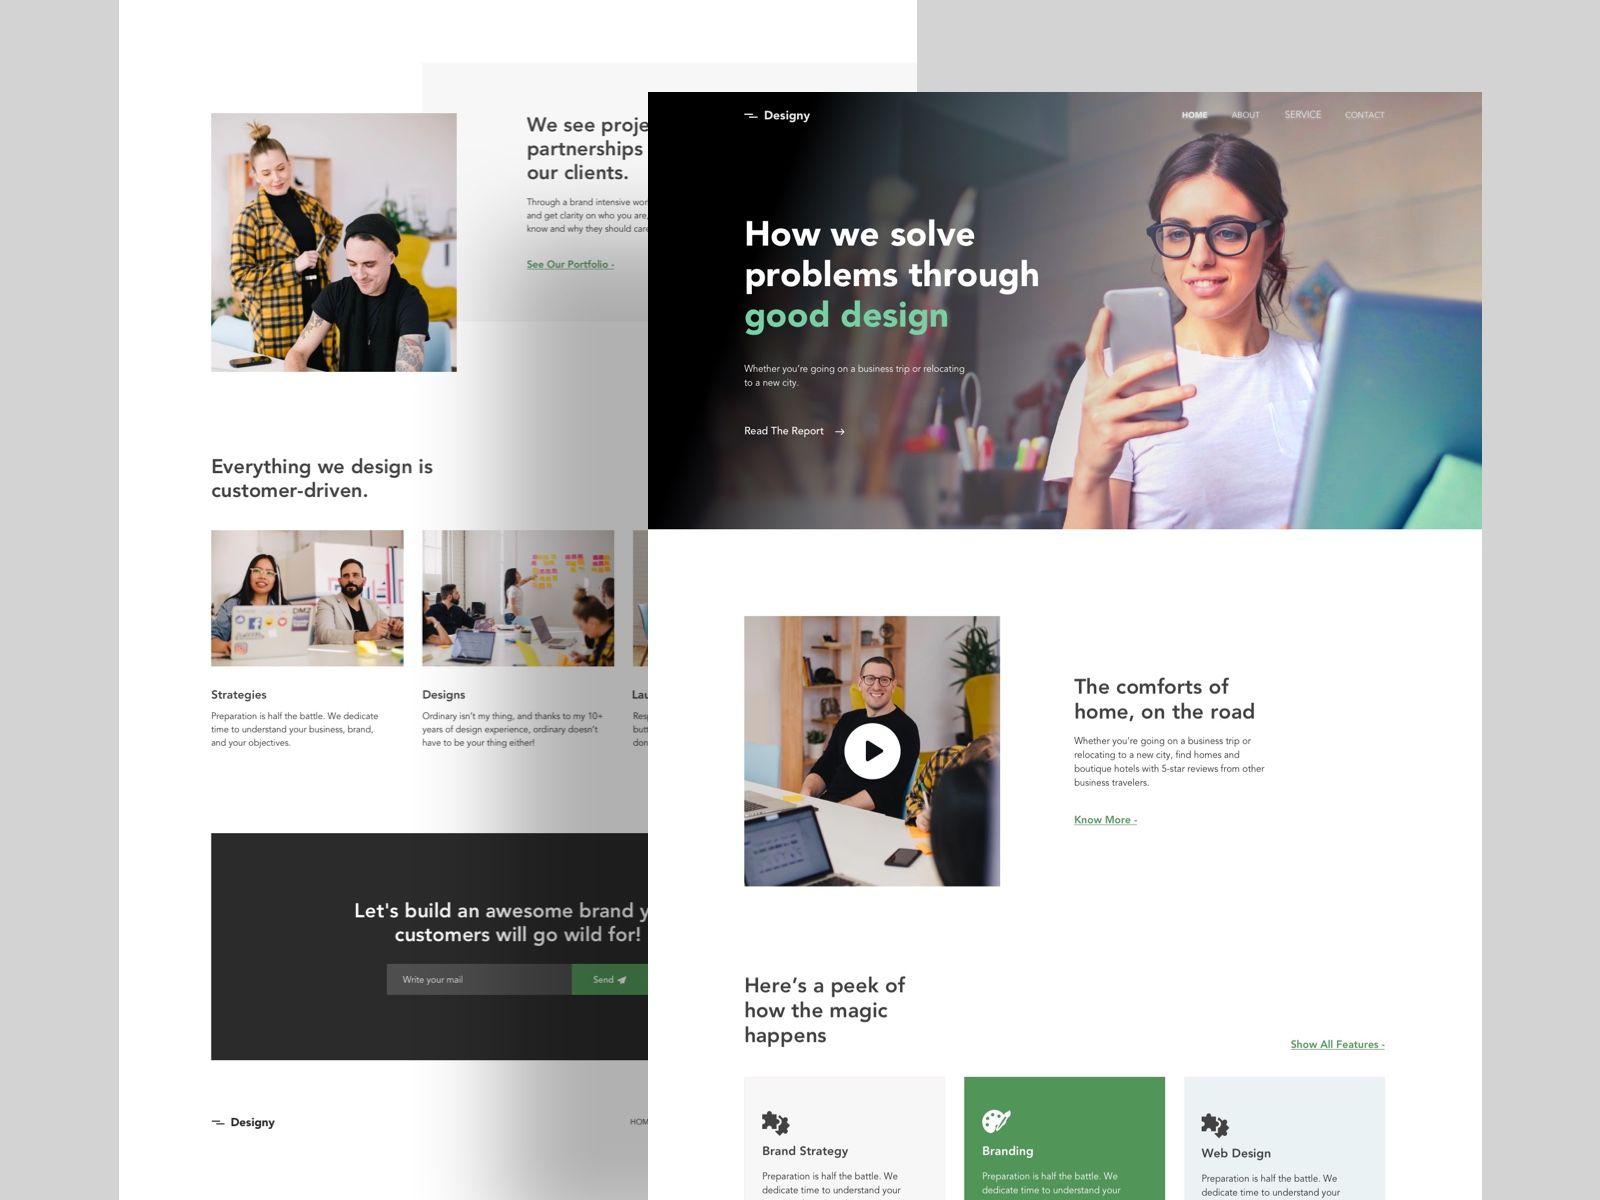 Design Firm Landing Page Exploration Landing Page Design Web Design Inspiration